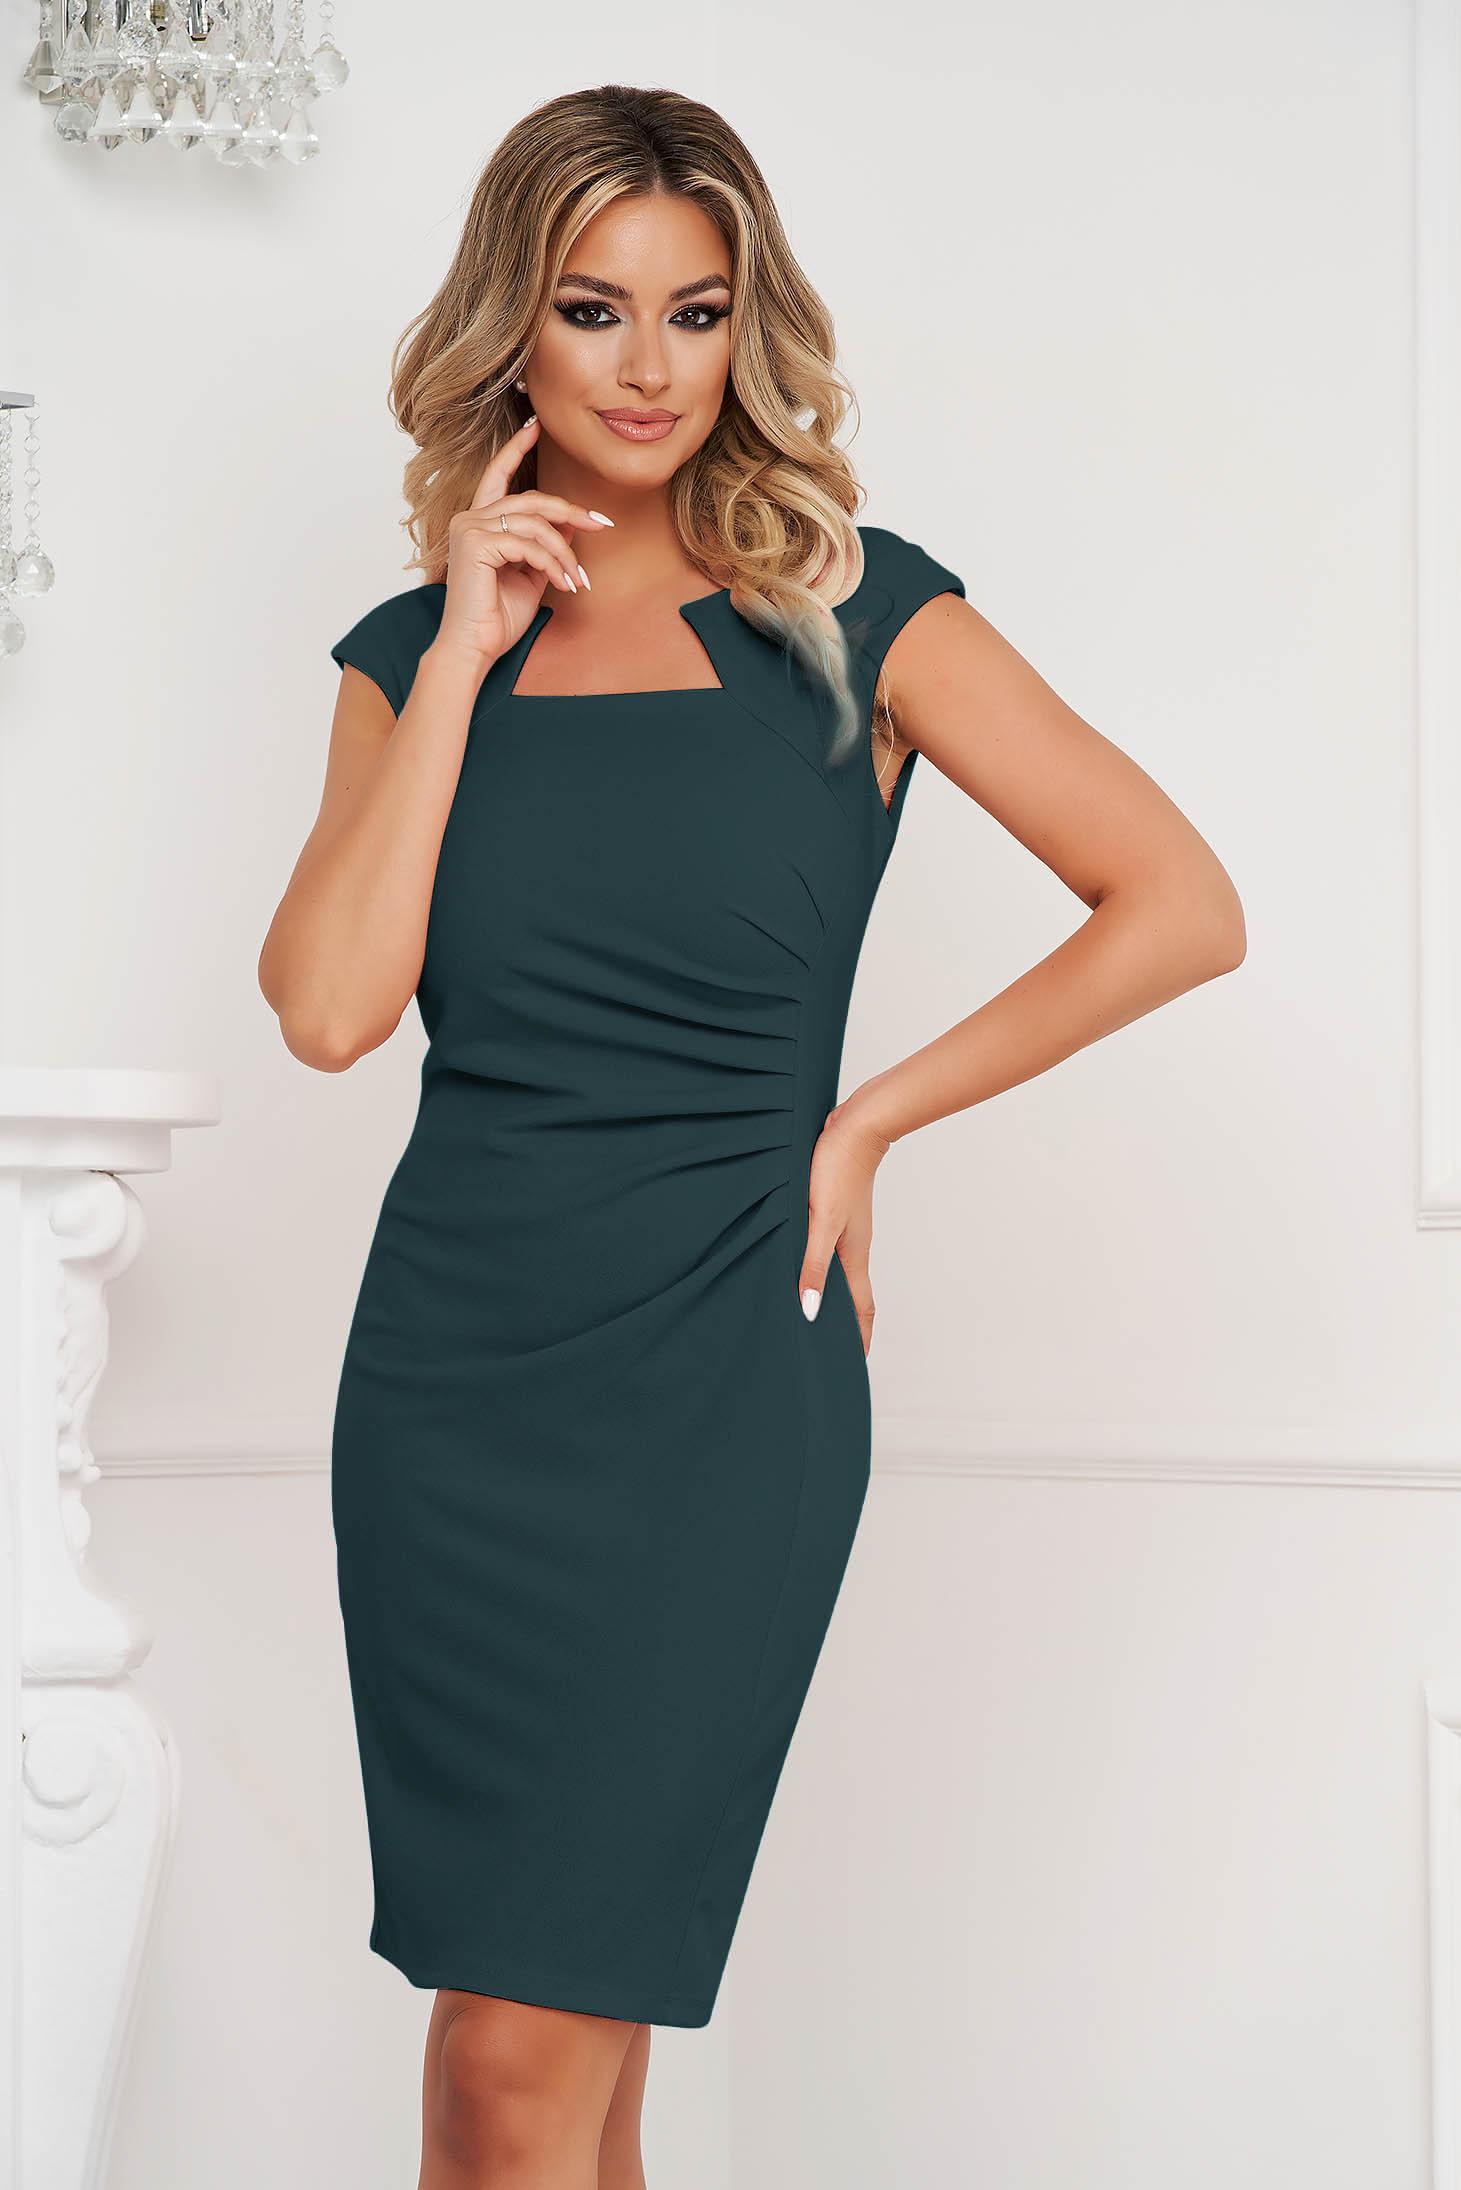 Darkgreen dress office short cut pencil from elastic fabric short sleeves